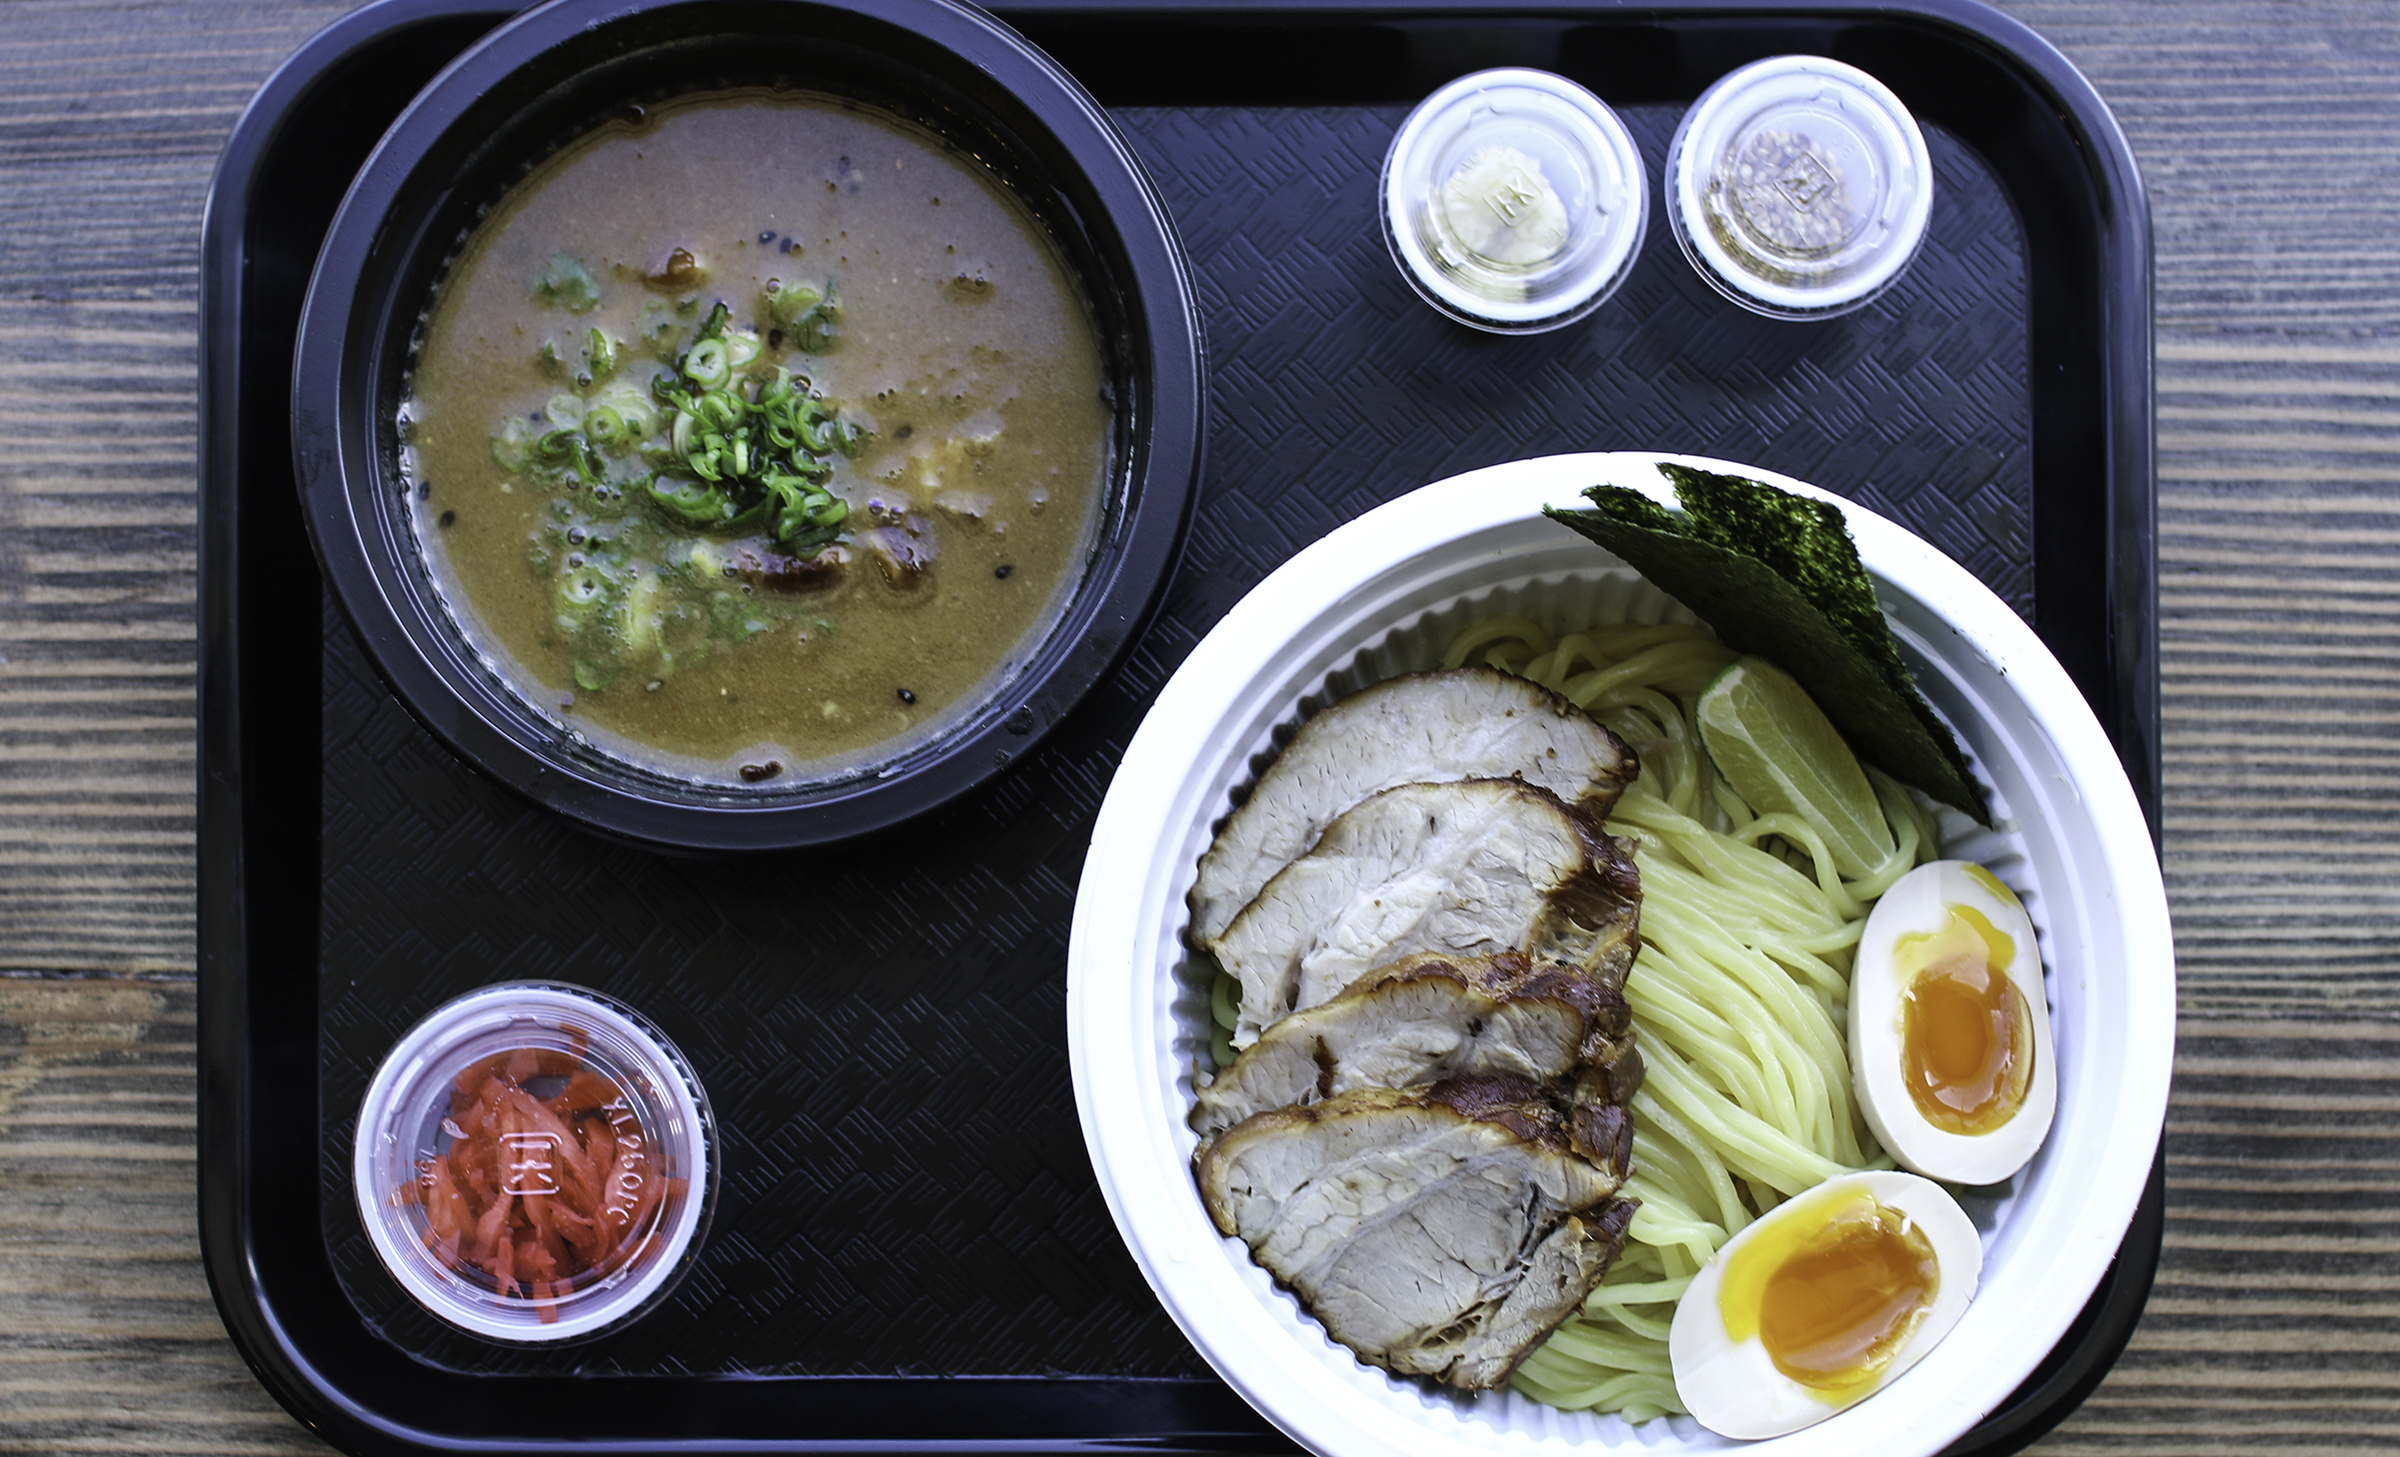 CHARSIU TSUKEMEN : FISH, PORK & CHICKEN BROTH,  tender pork belly (charsiu), bambooshoots, green onions, egg, lime & seaweed